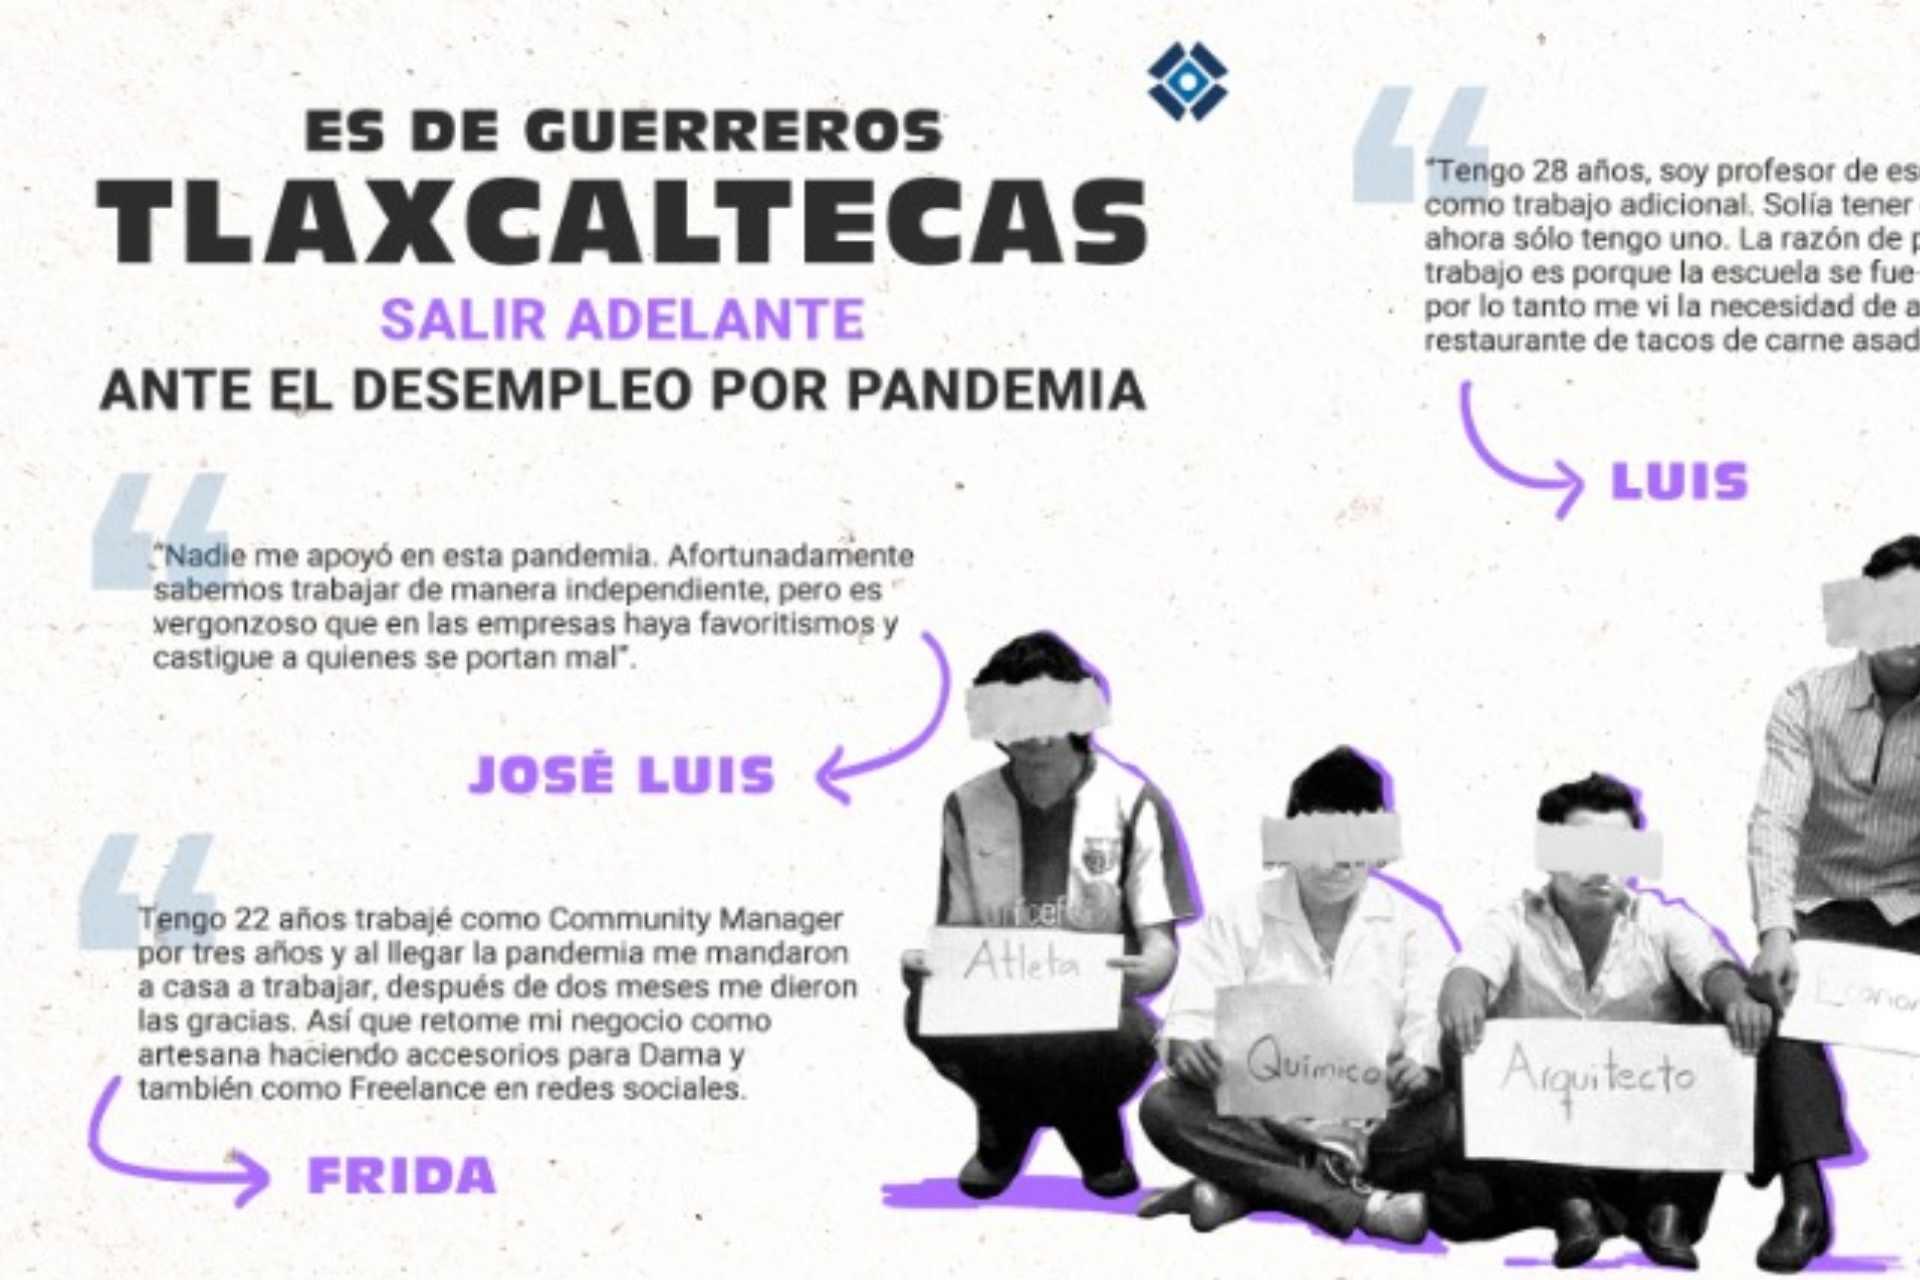 tlaxcaltecas-desempleo-covid-19-coronavirus